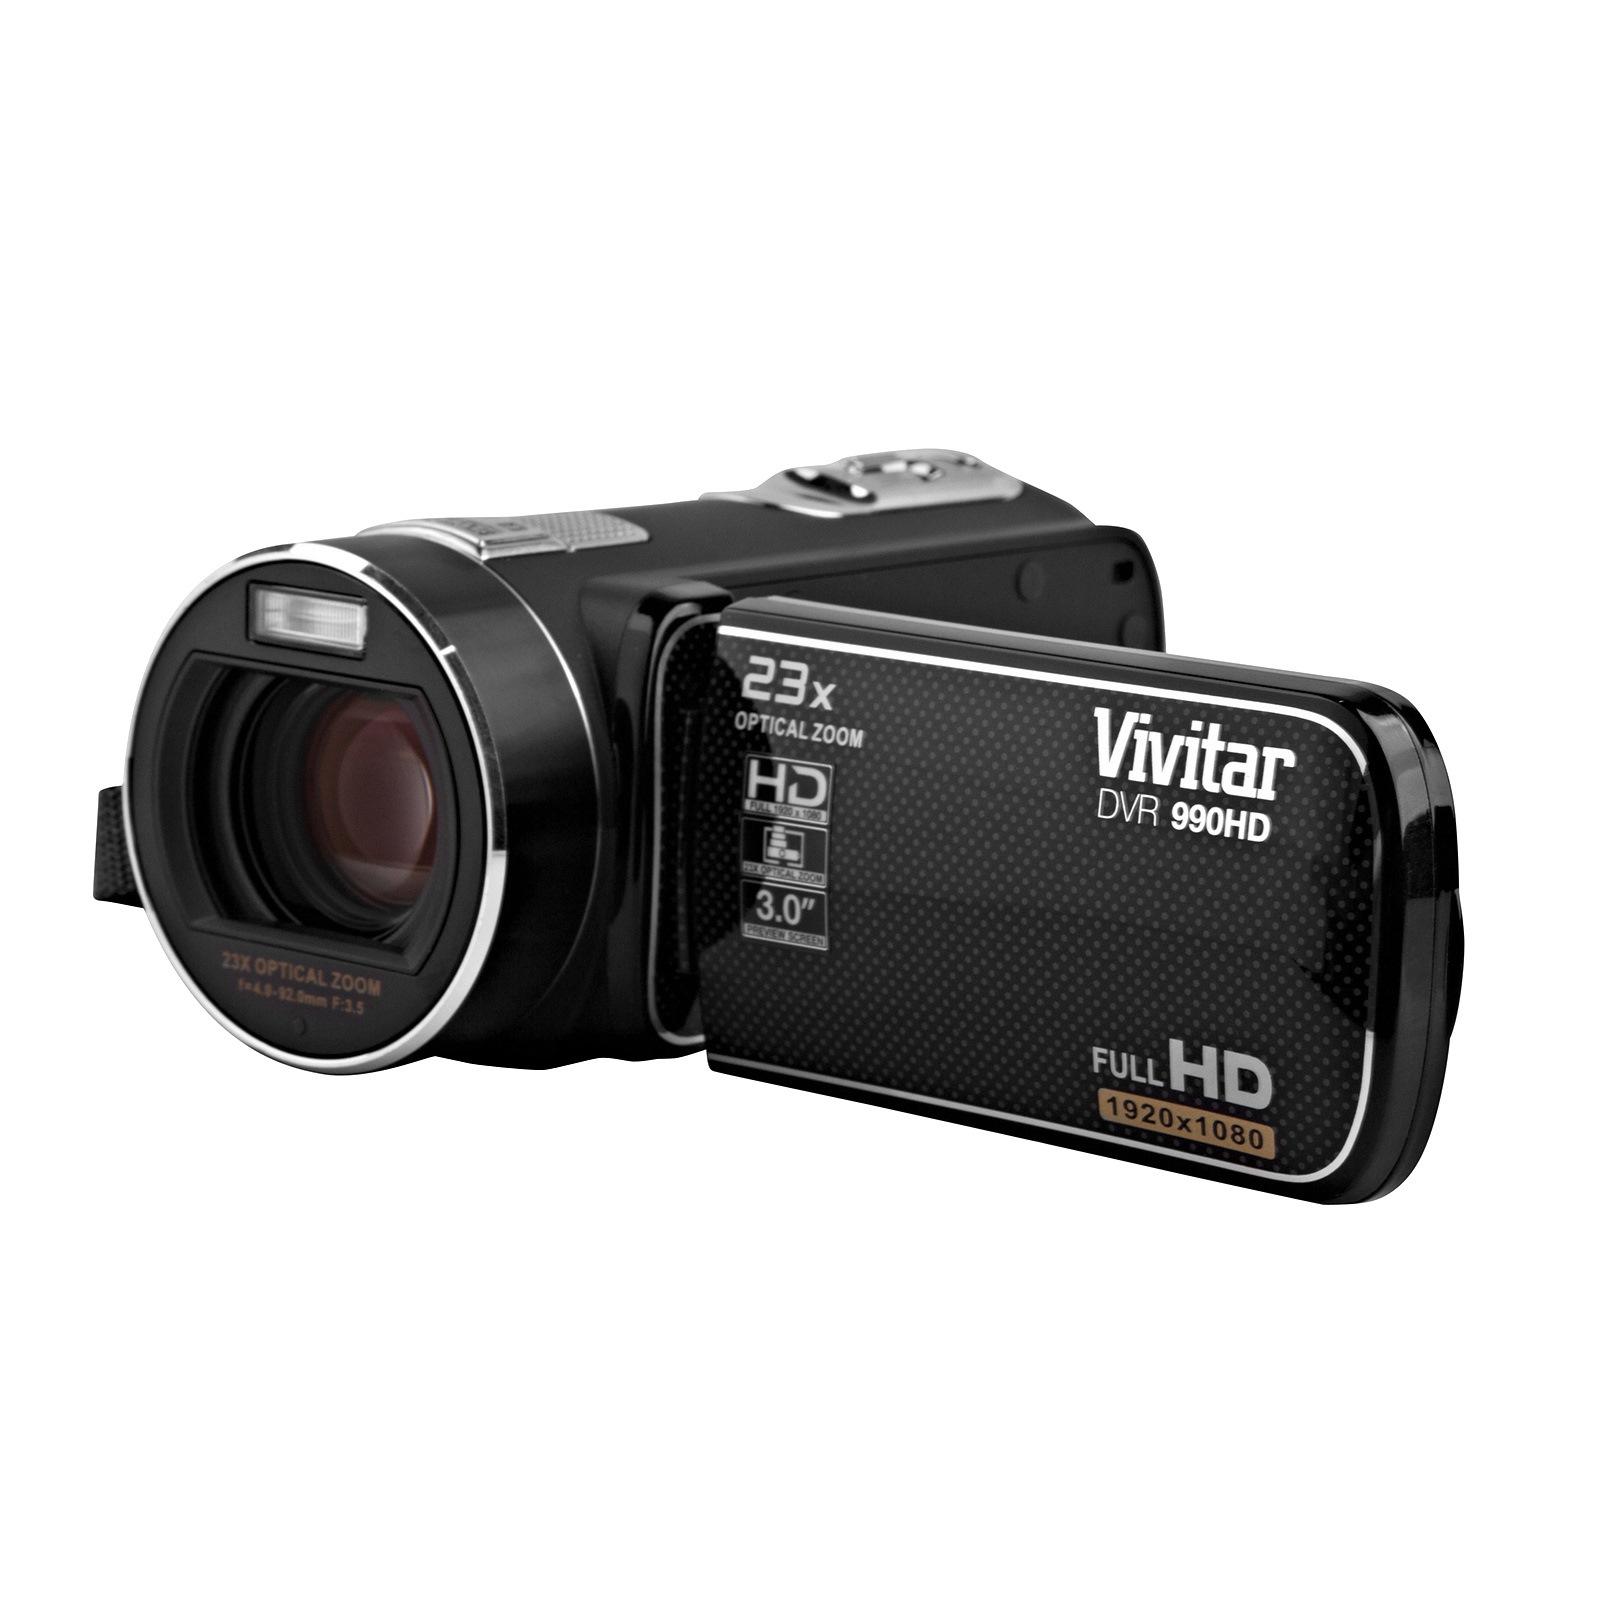 Vivitar DVR 990HD 10.1MP with 23x Optical Zoom Digital Video Recorder Camcorder Black Accessory Bundle